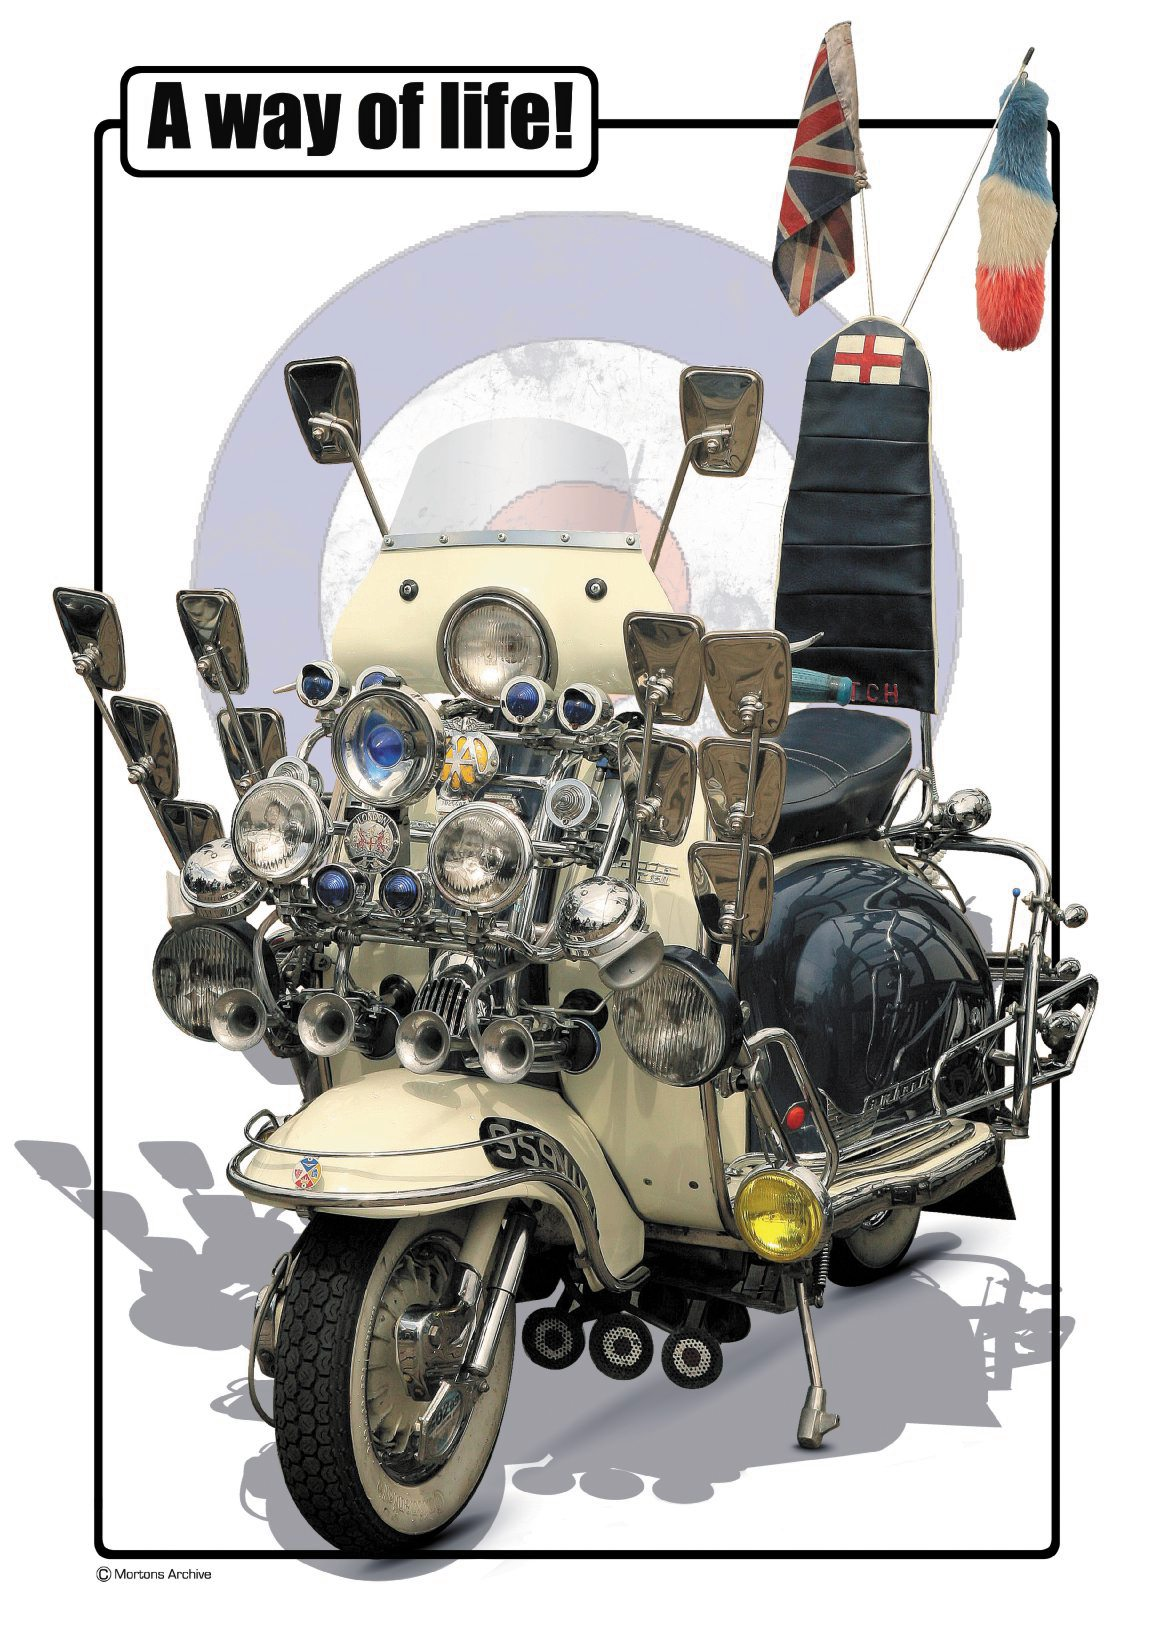 A3 poster of a Lambretta classic mod scooter - I